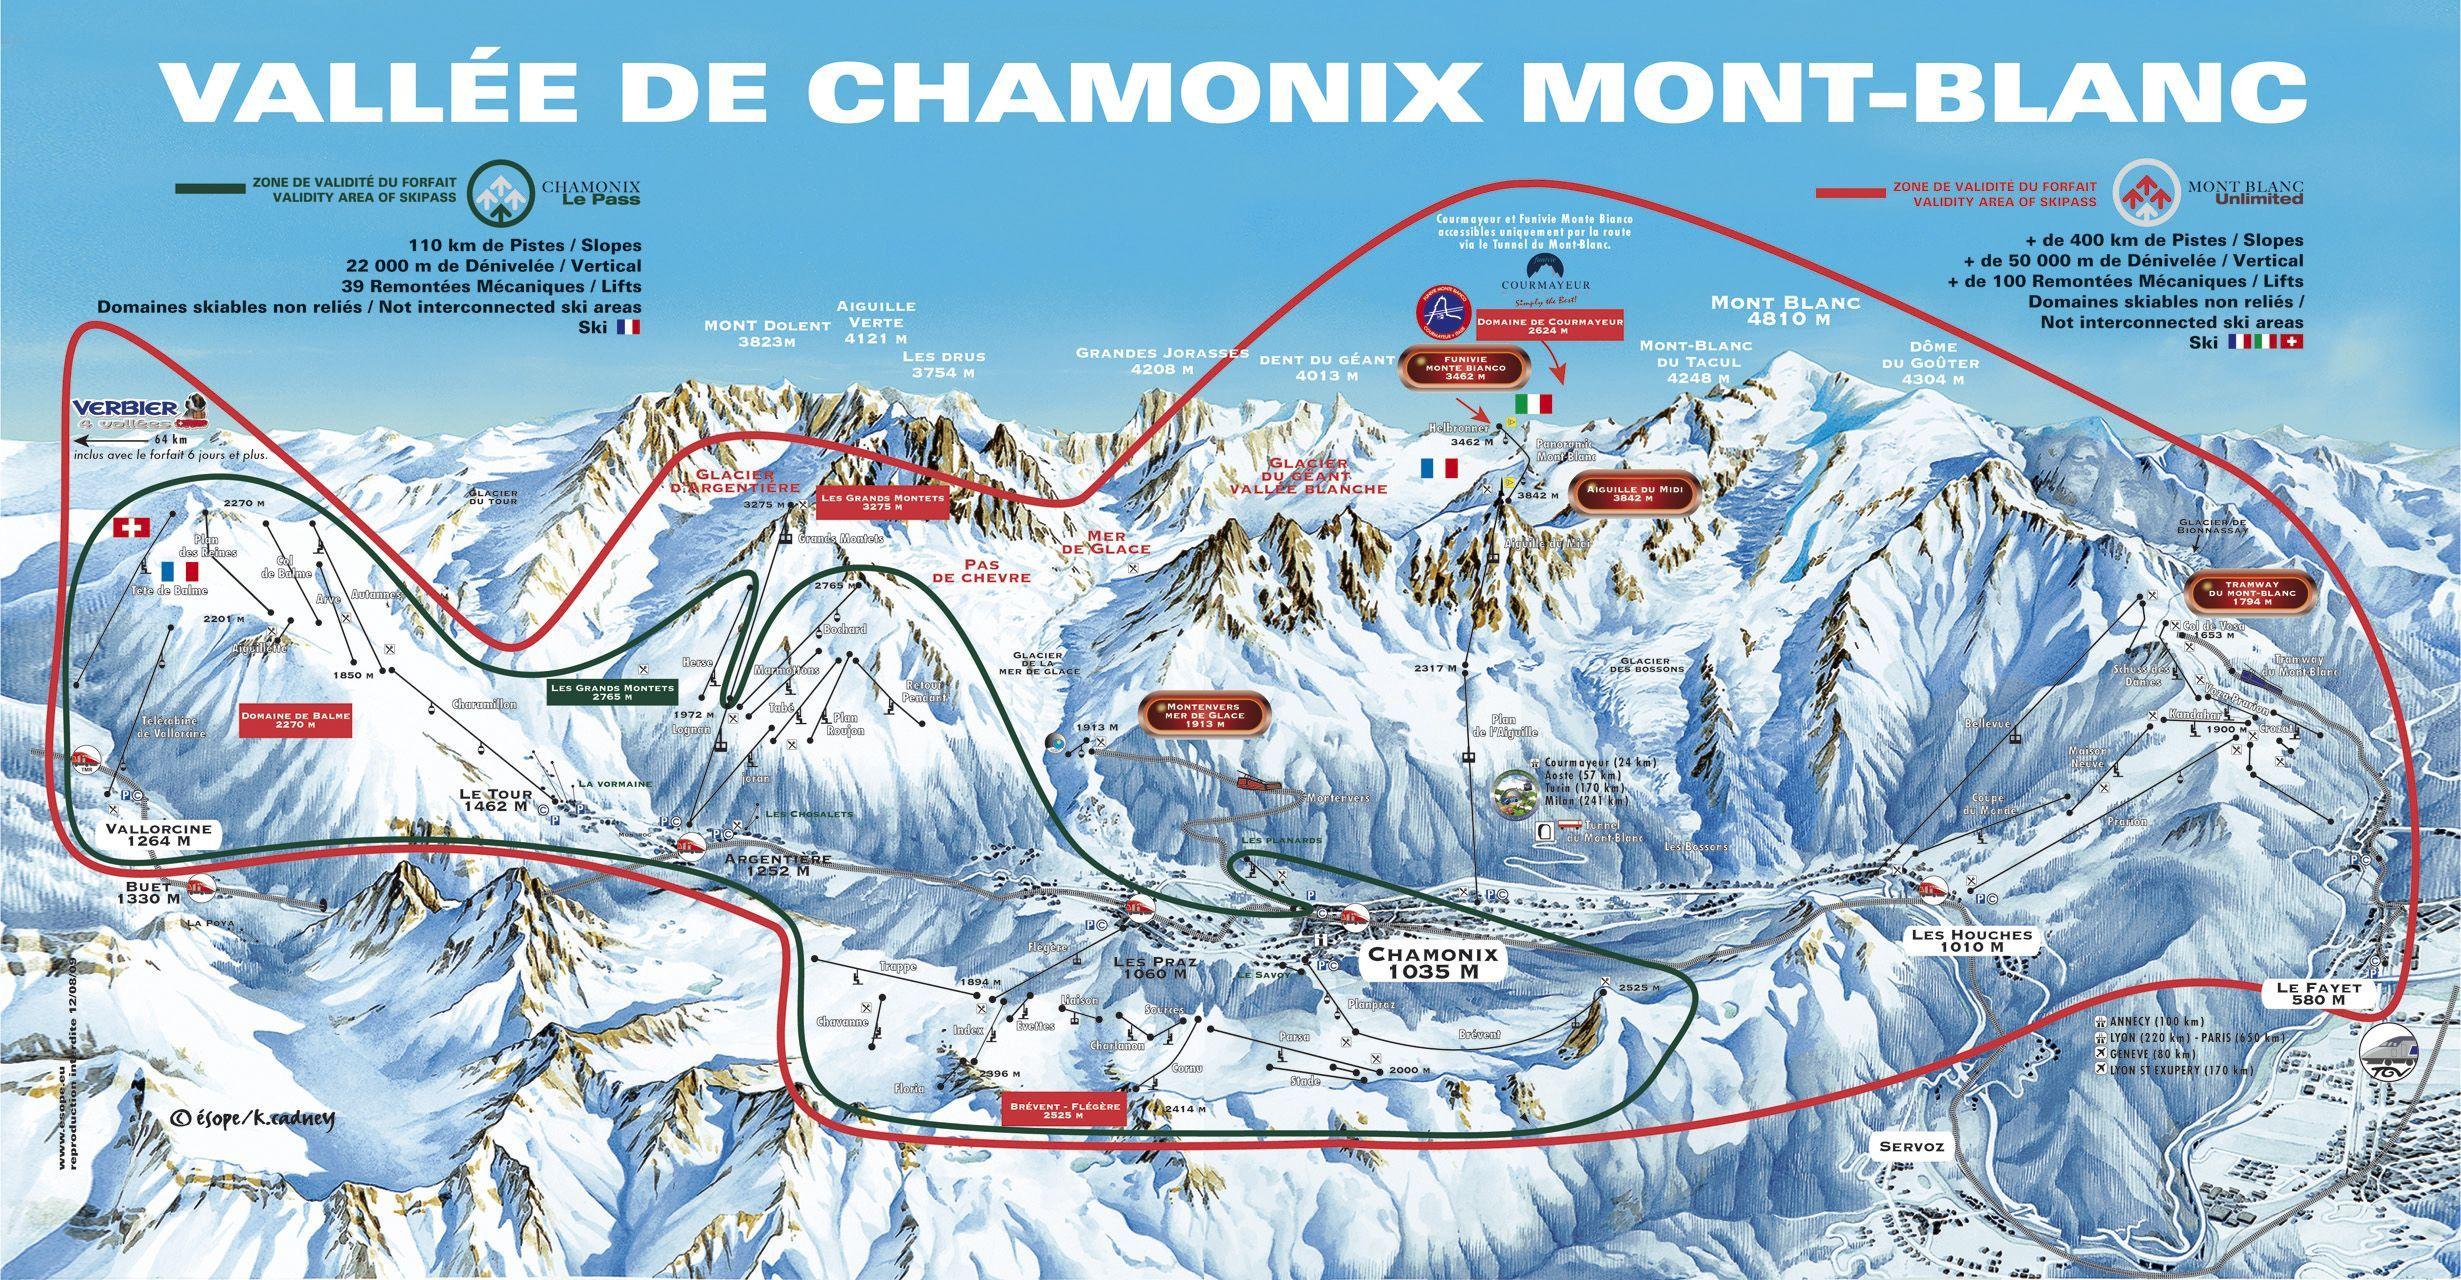 Chamonix Piste Map hair Pinterest Mont blanc and Destinations